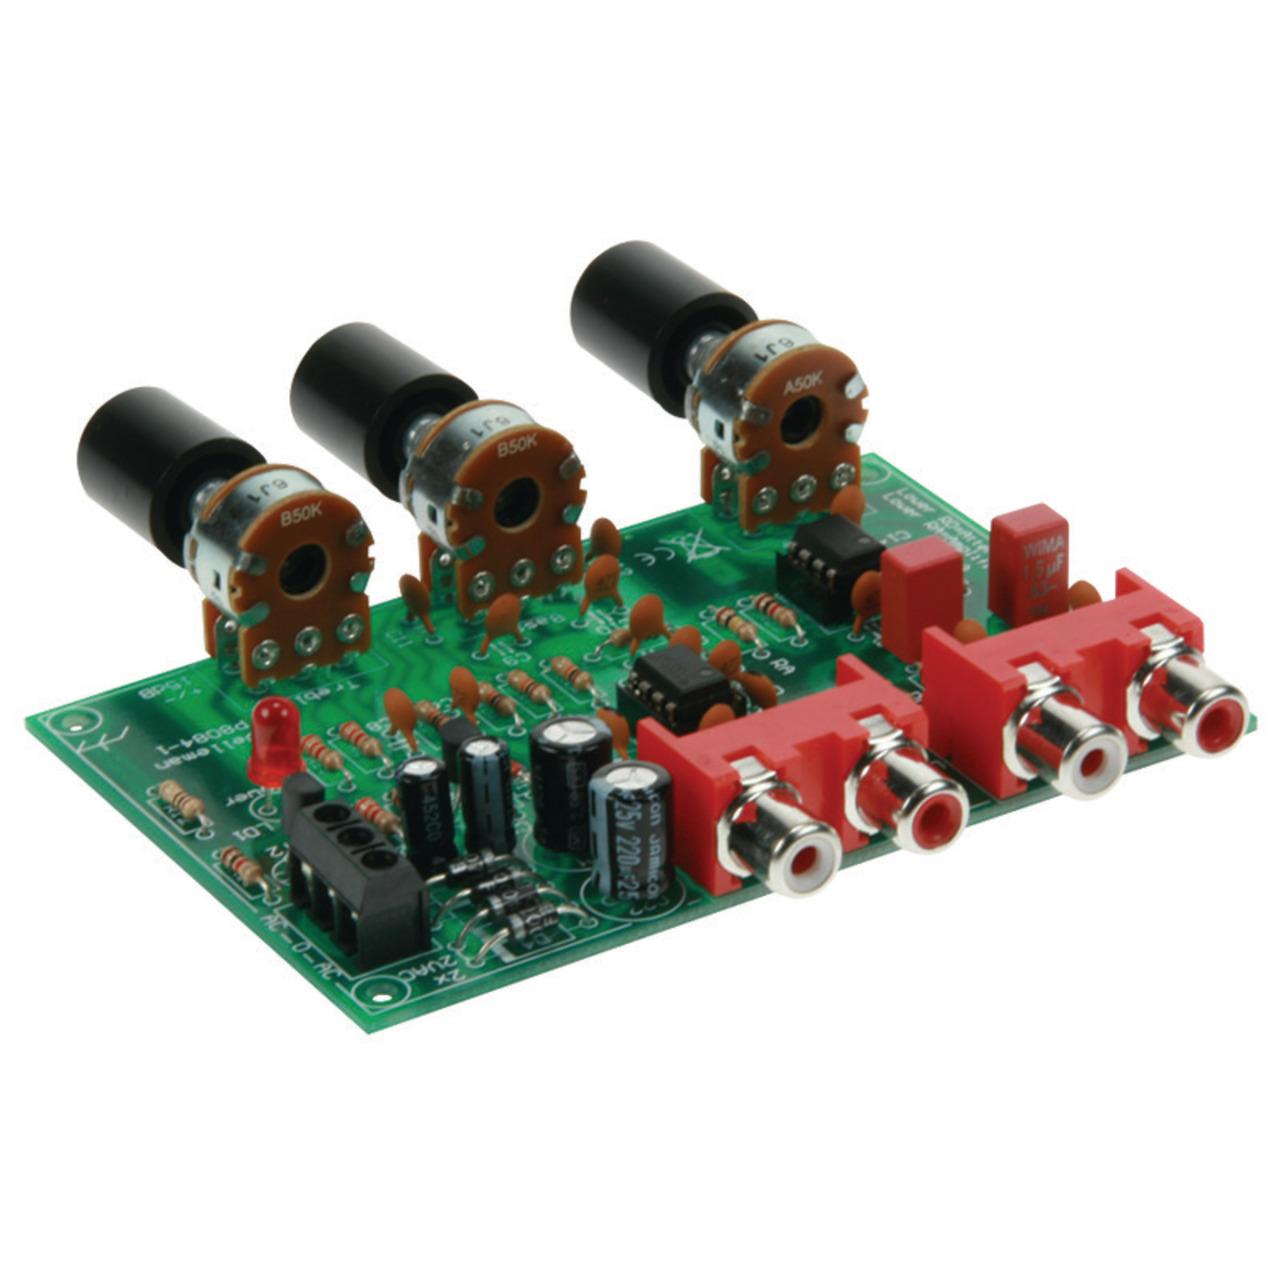 Velleman Bausatz K8084 Vorverstärker Lautstärke- und Klangregelung